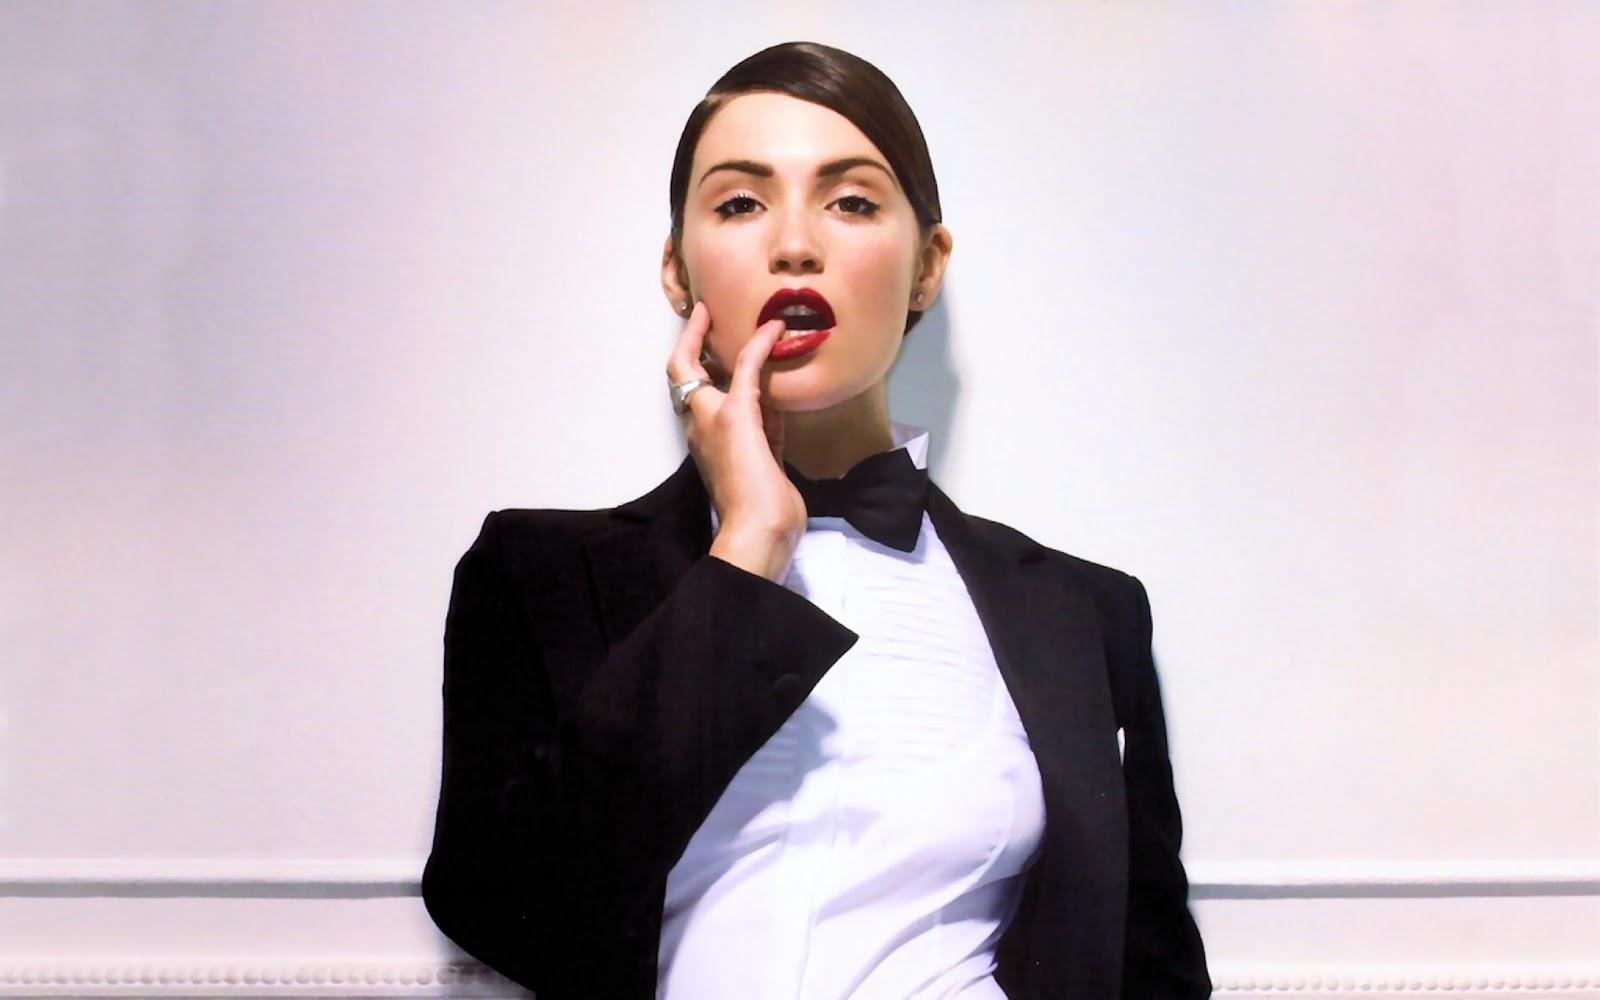 http://3.bp.blogspot.com/-s6ZM6yAUCt8/TyME6bzIeoI/AAAAAAAAENc/j2cxd5k6Zz4/s1600/Gemma-Arterton-Photo-shoot.jpg